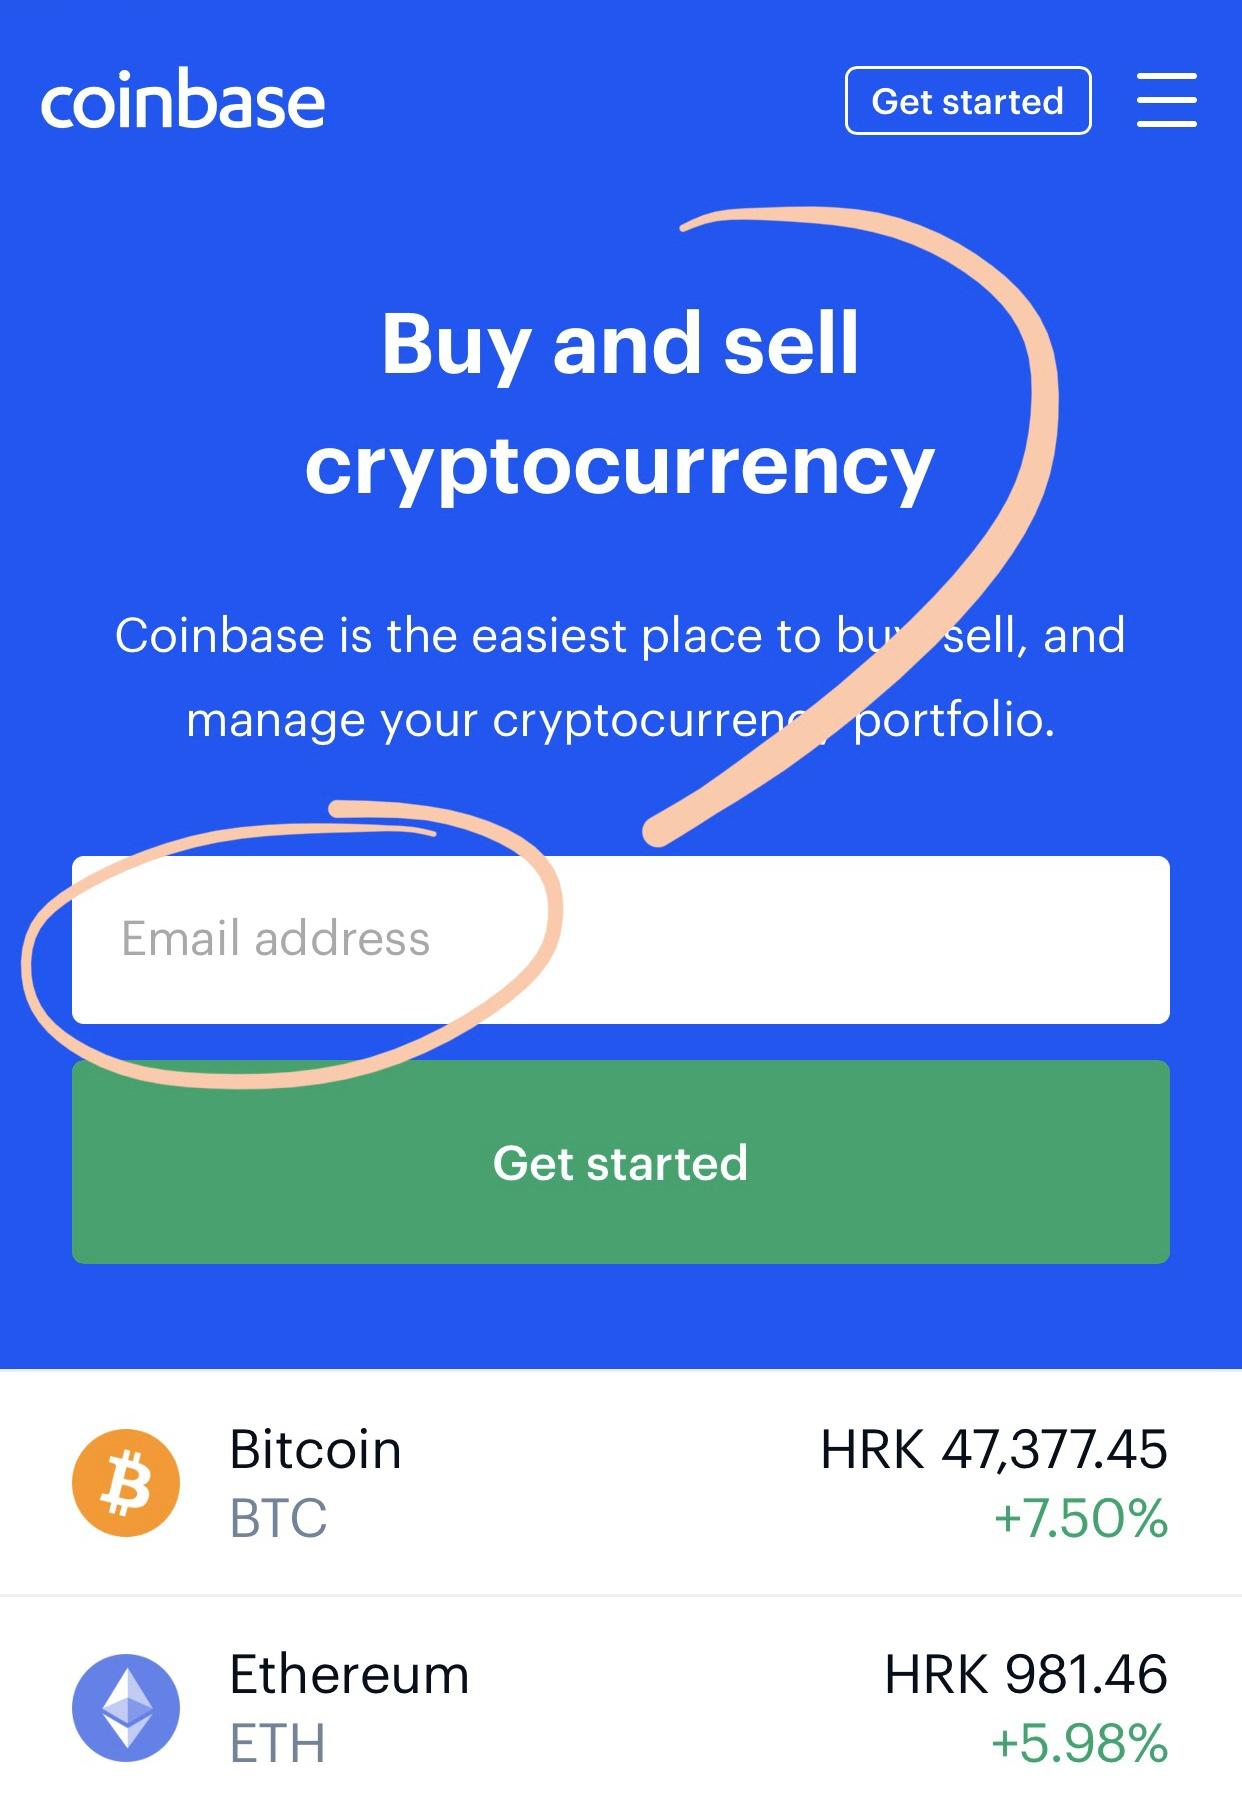 kako kupiti kriptovalute